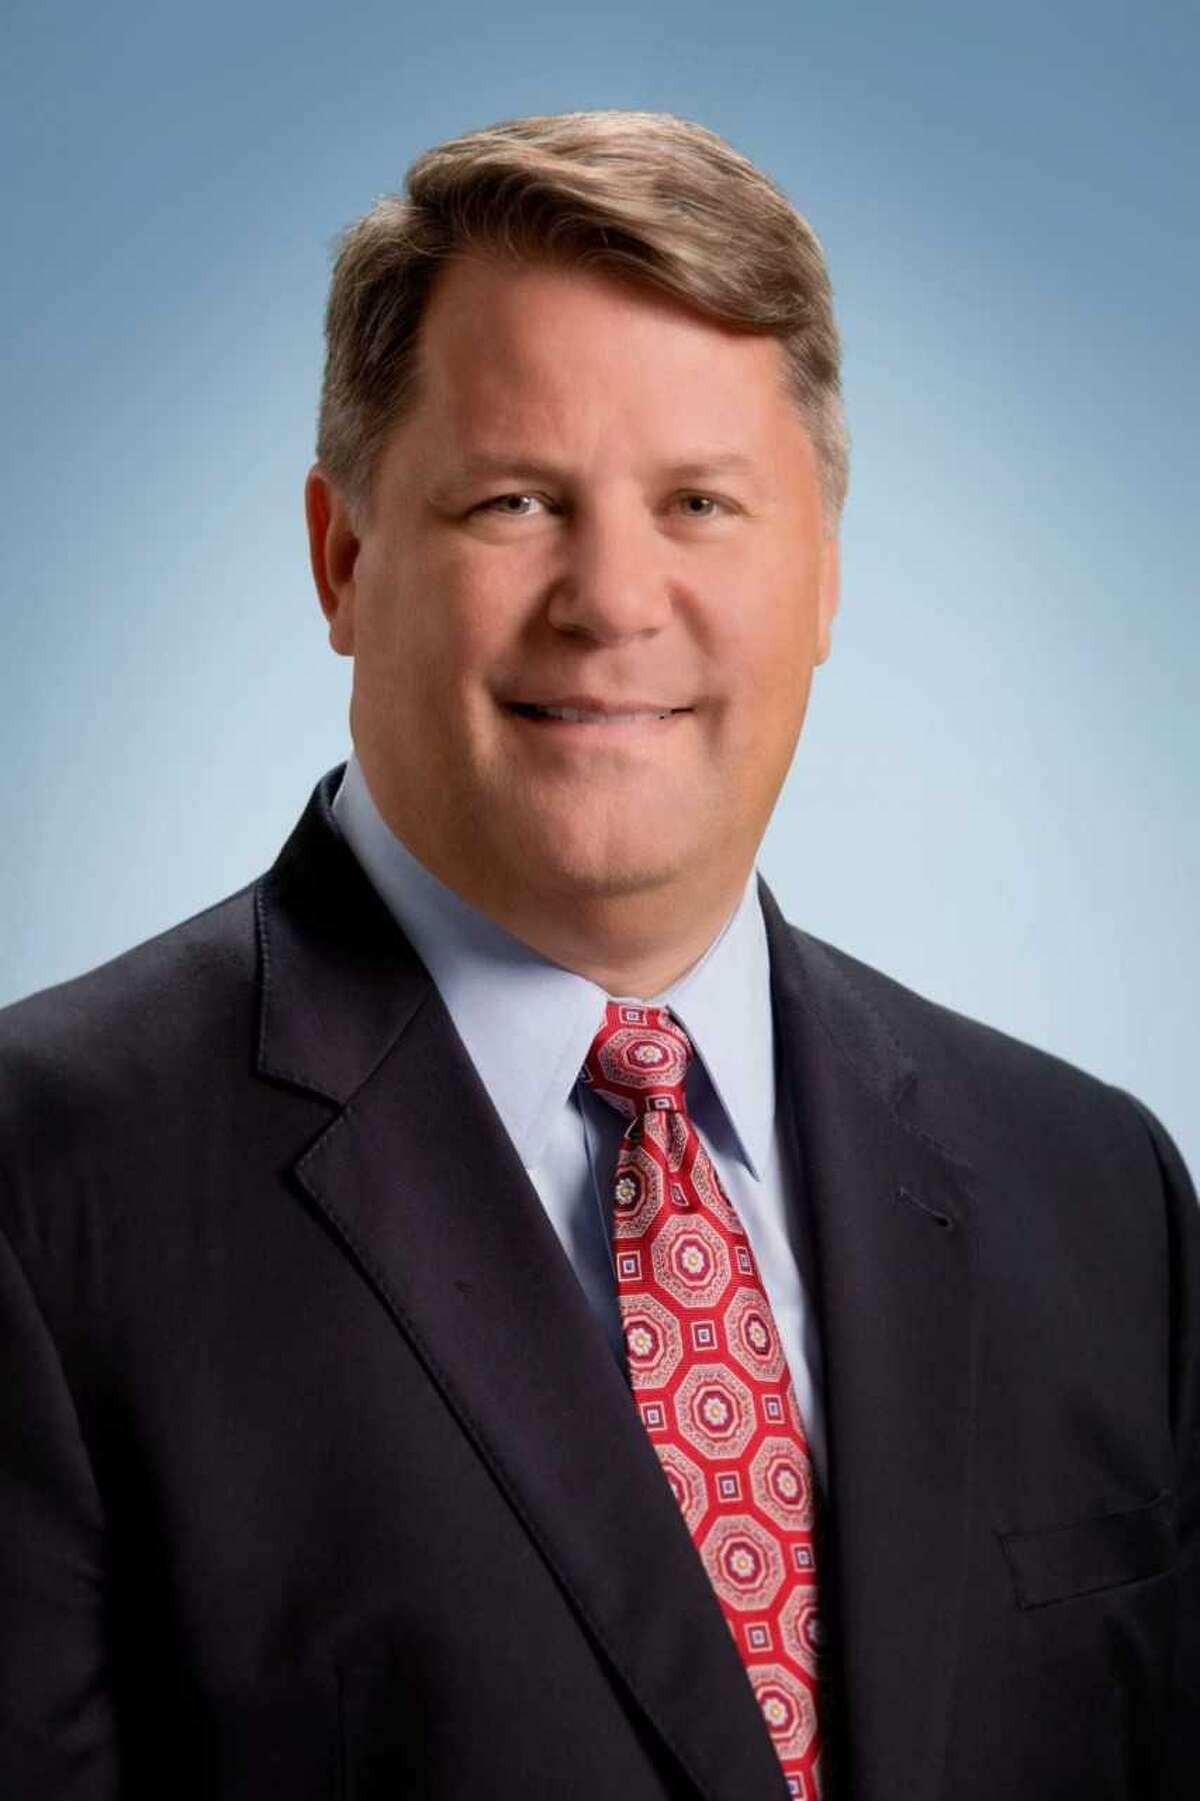 Keith Barber, CEO of Houston Methodist Willowbrook Hospital.